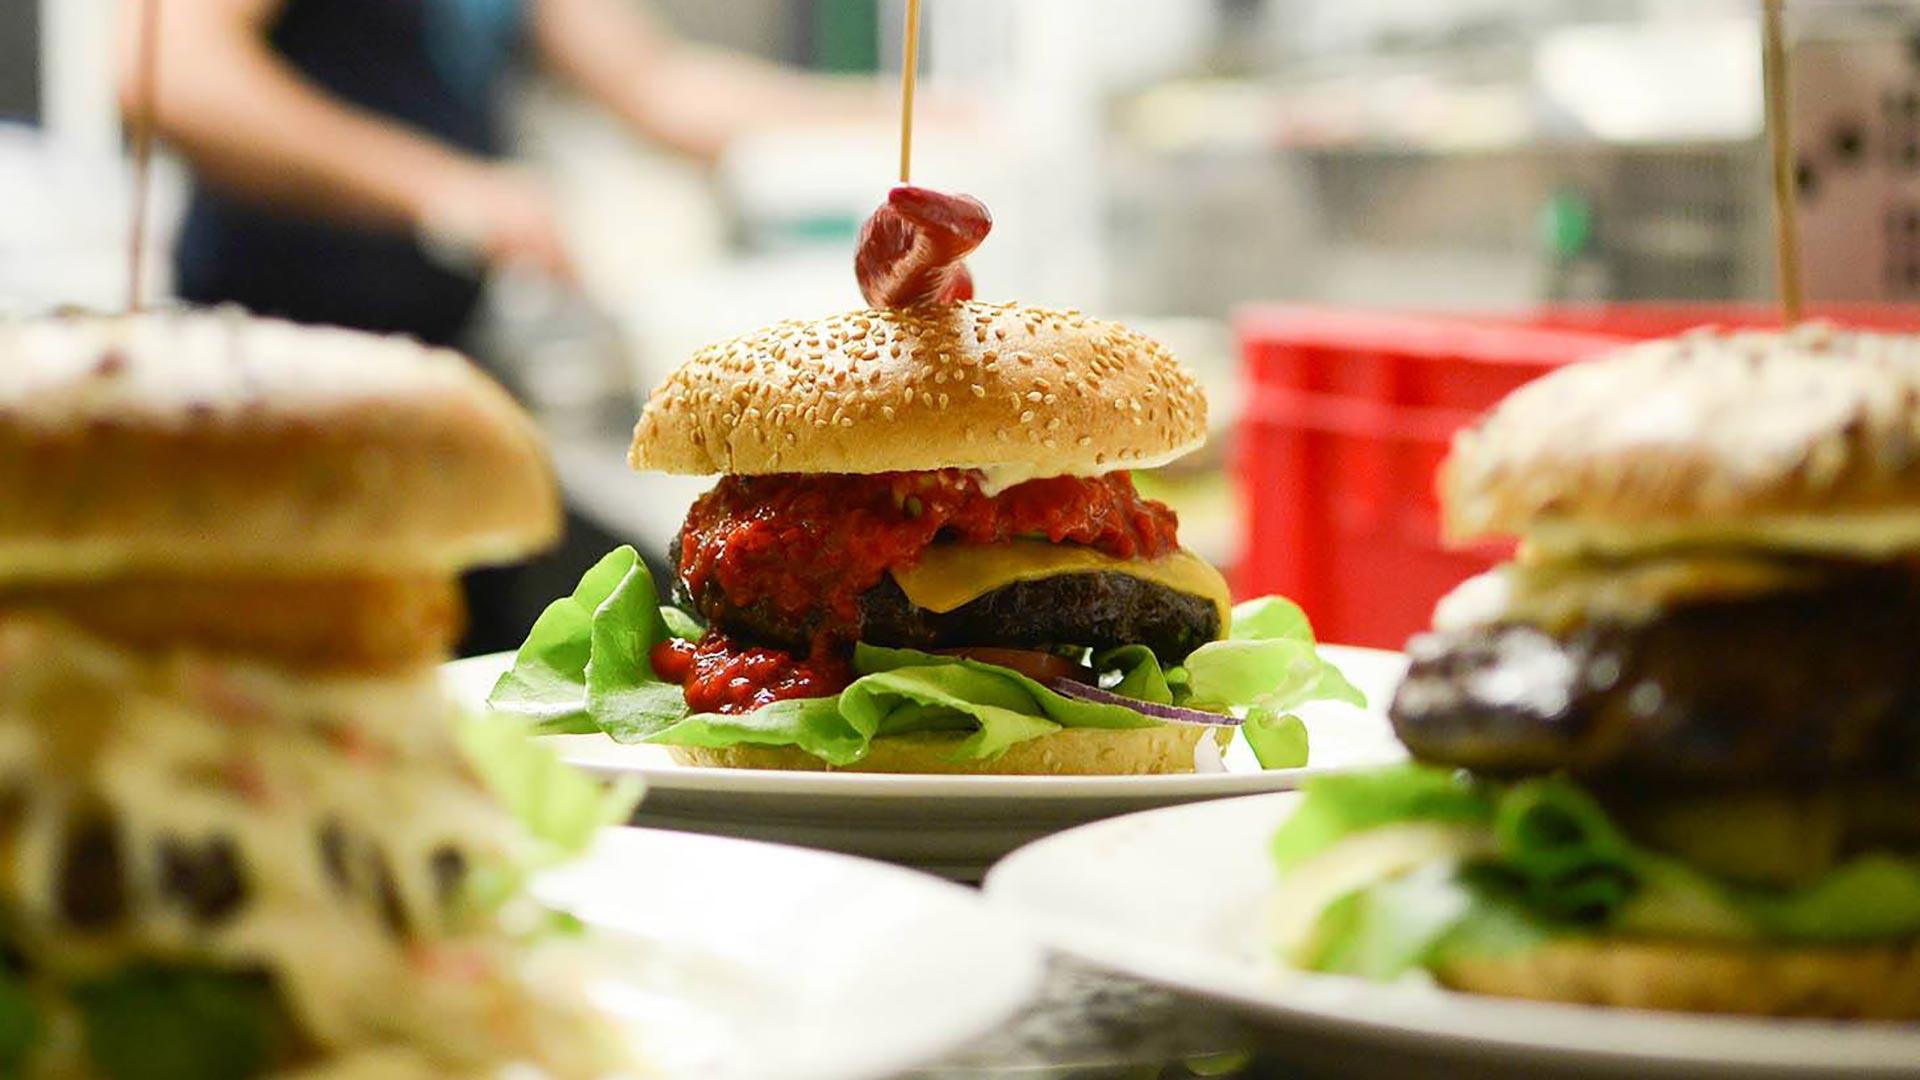 Velkommen til Vesterbros original Burgerrestaurant